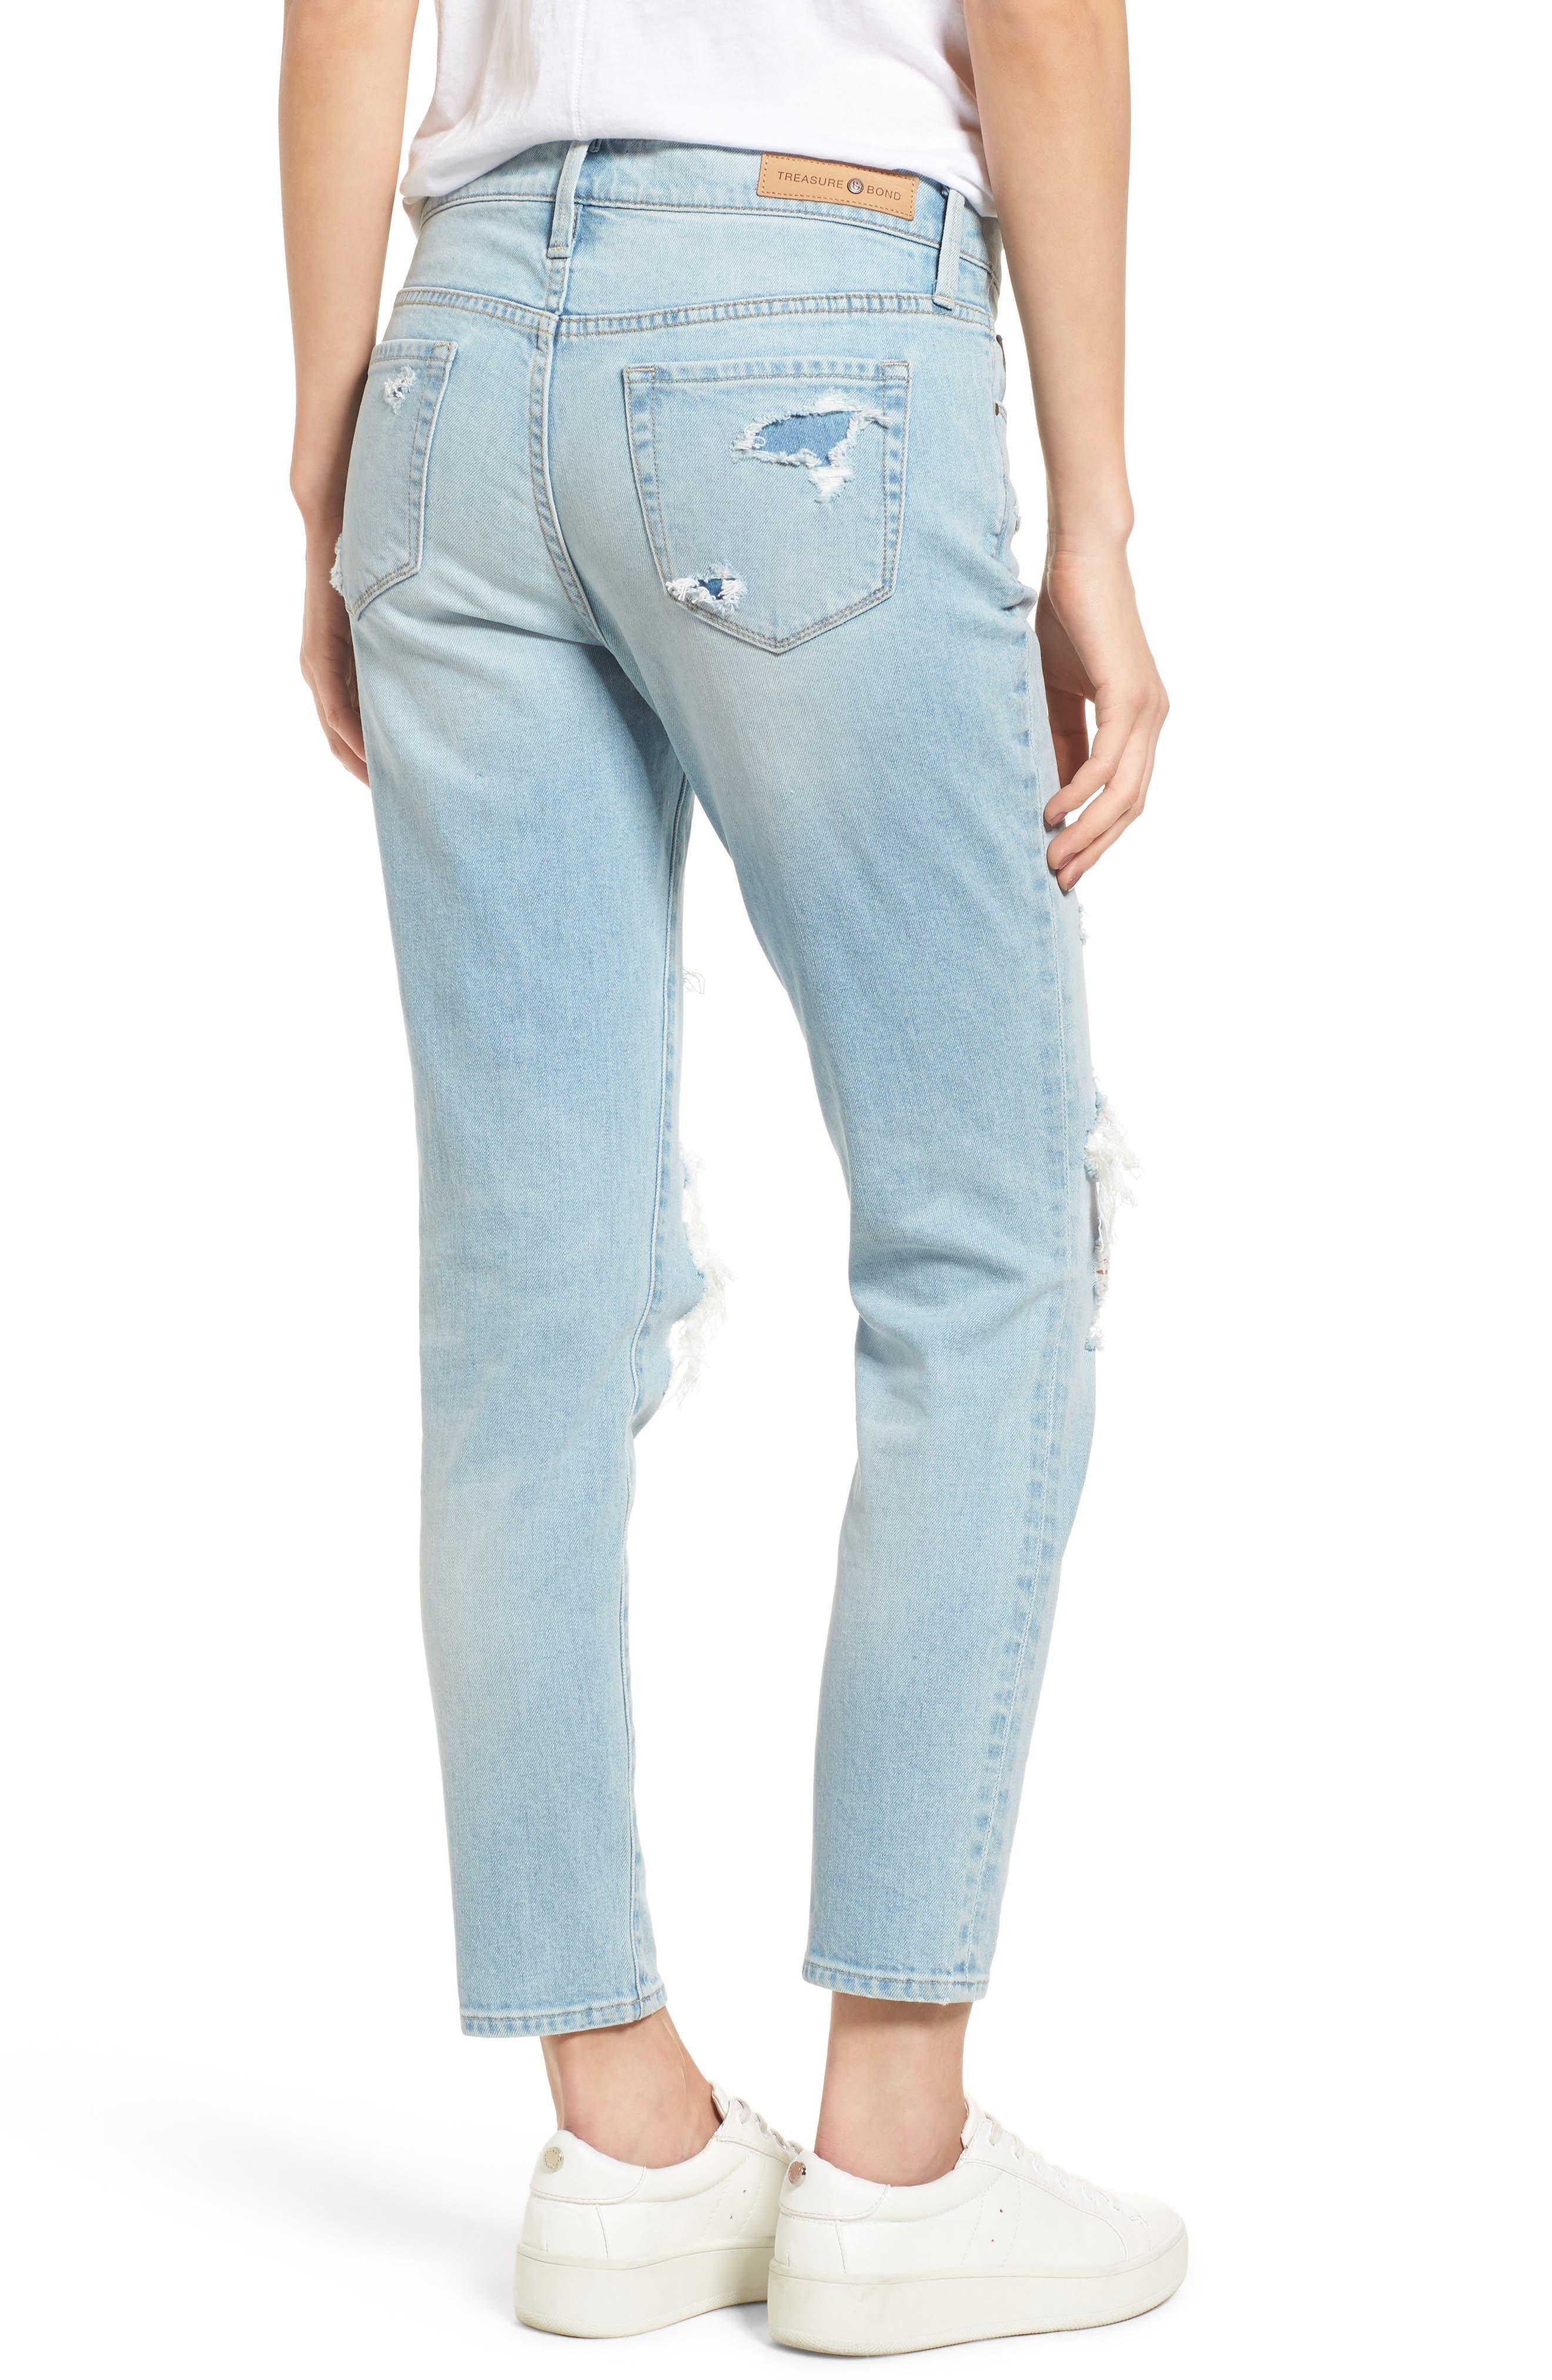 TREASURE & BOND,                             Skinny Boyfriend Jeans,                             Alternate thumbnail 2, color,                             400